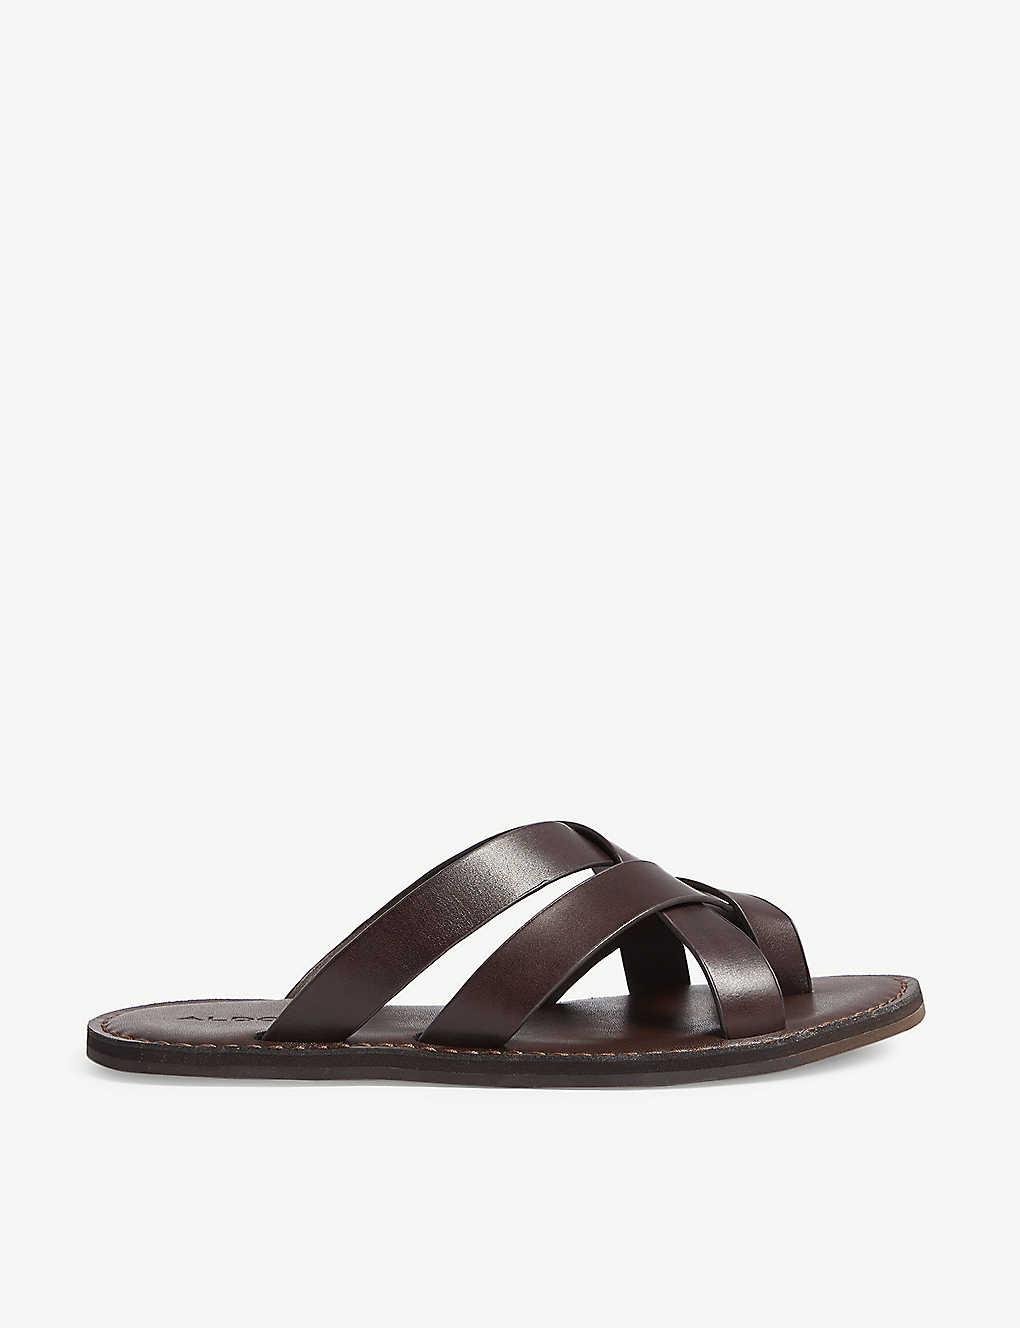 Poade high platform sandals - Black patent ...